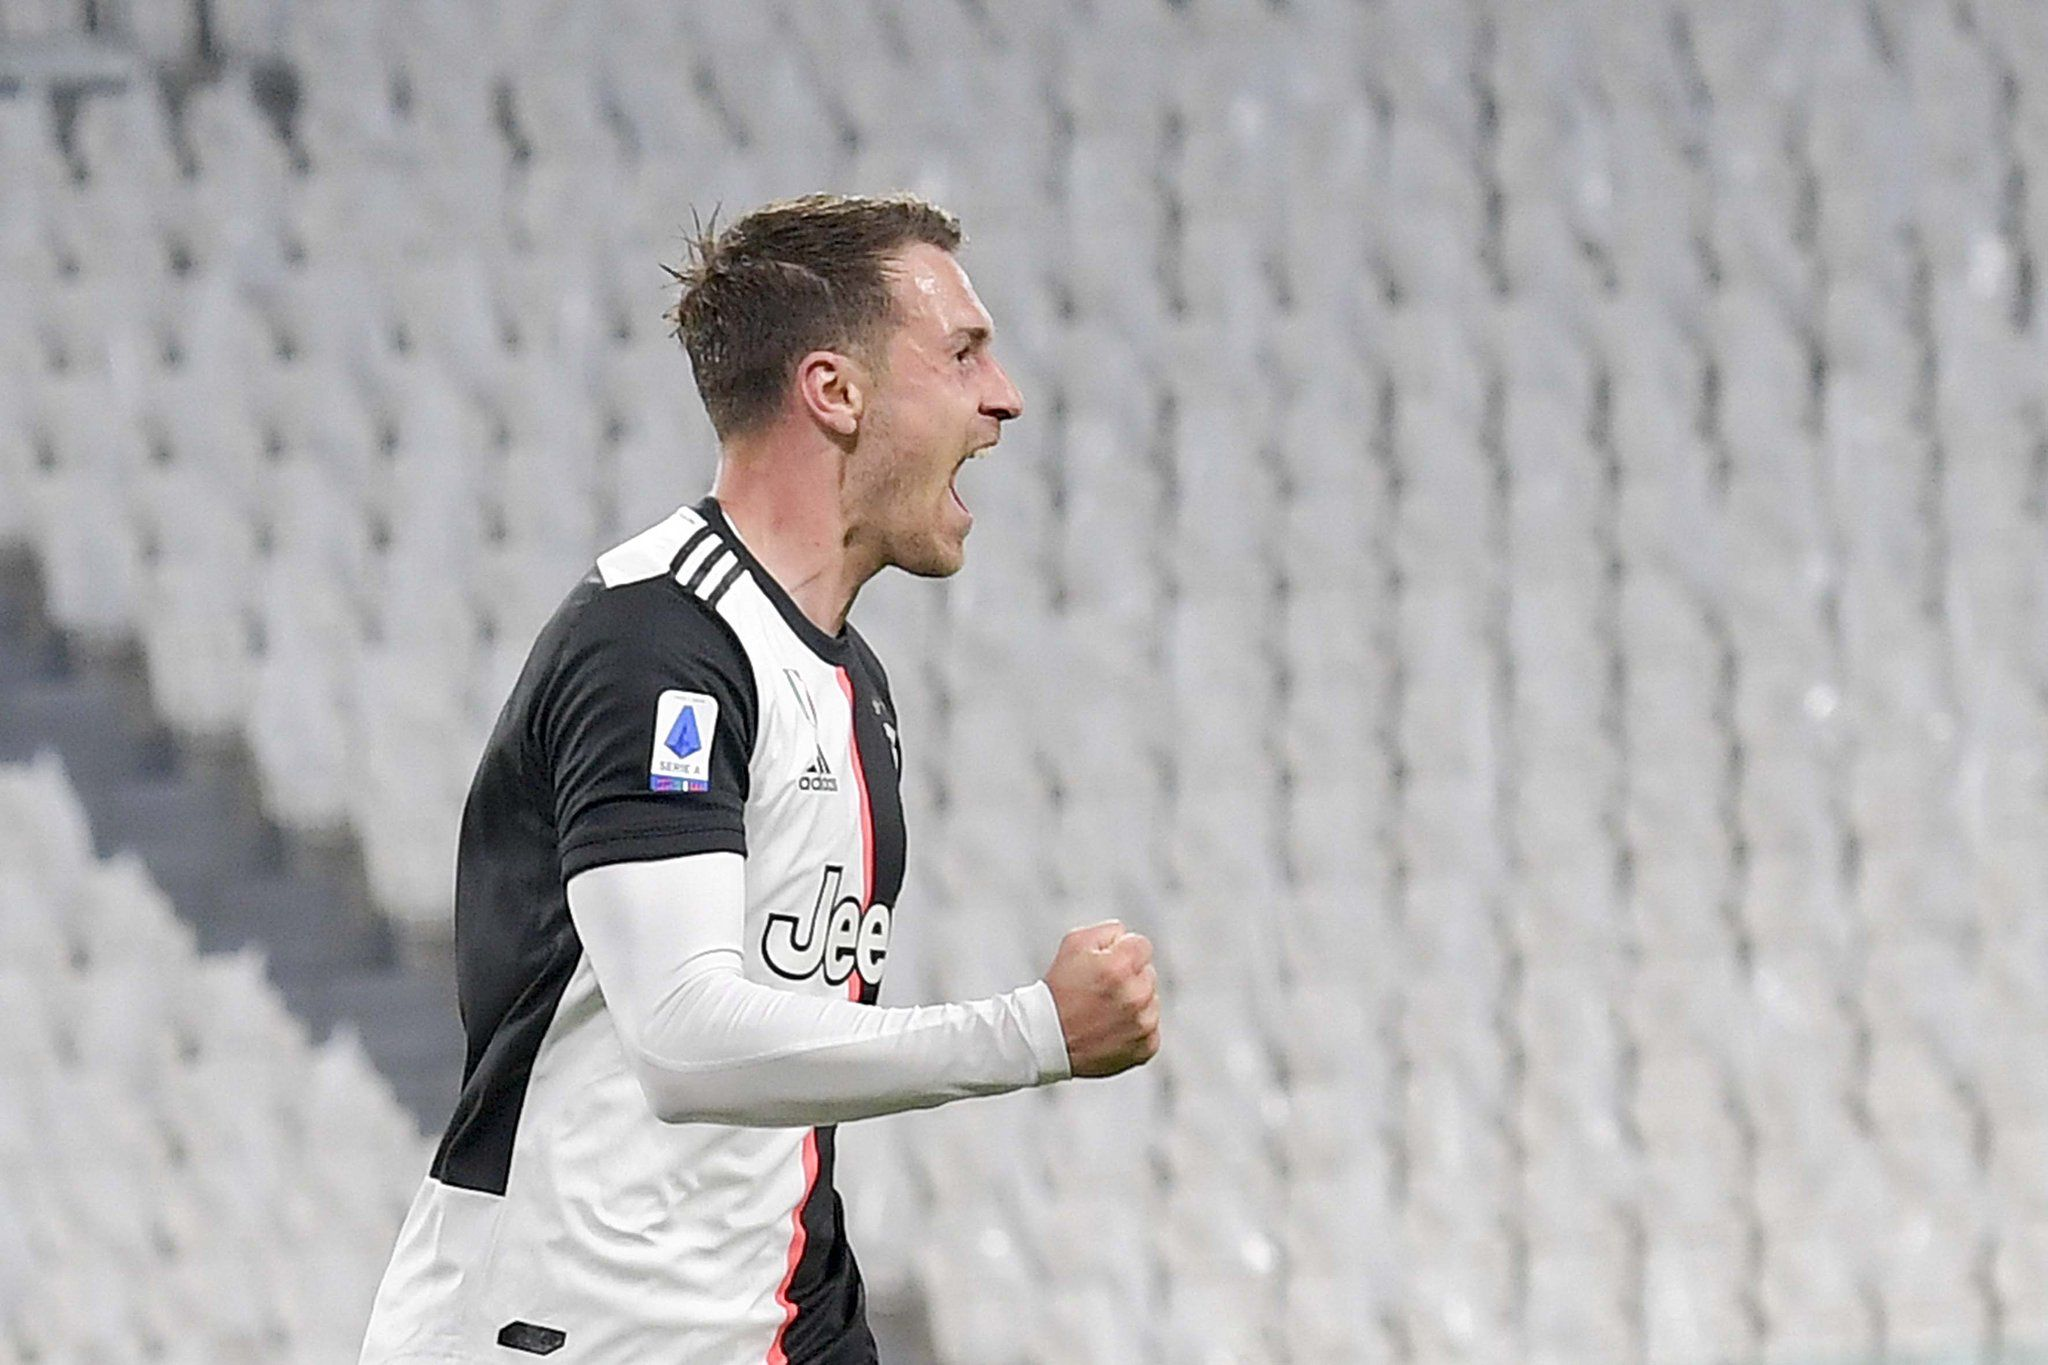 Pin by 𝚞𝚟 on Juventus in 2020 (With images) Juventus